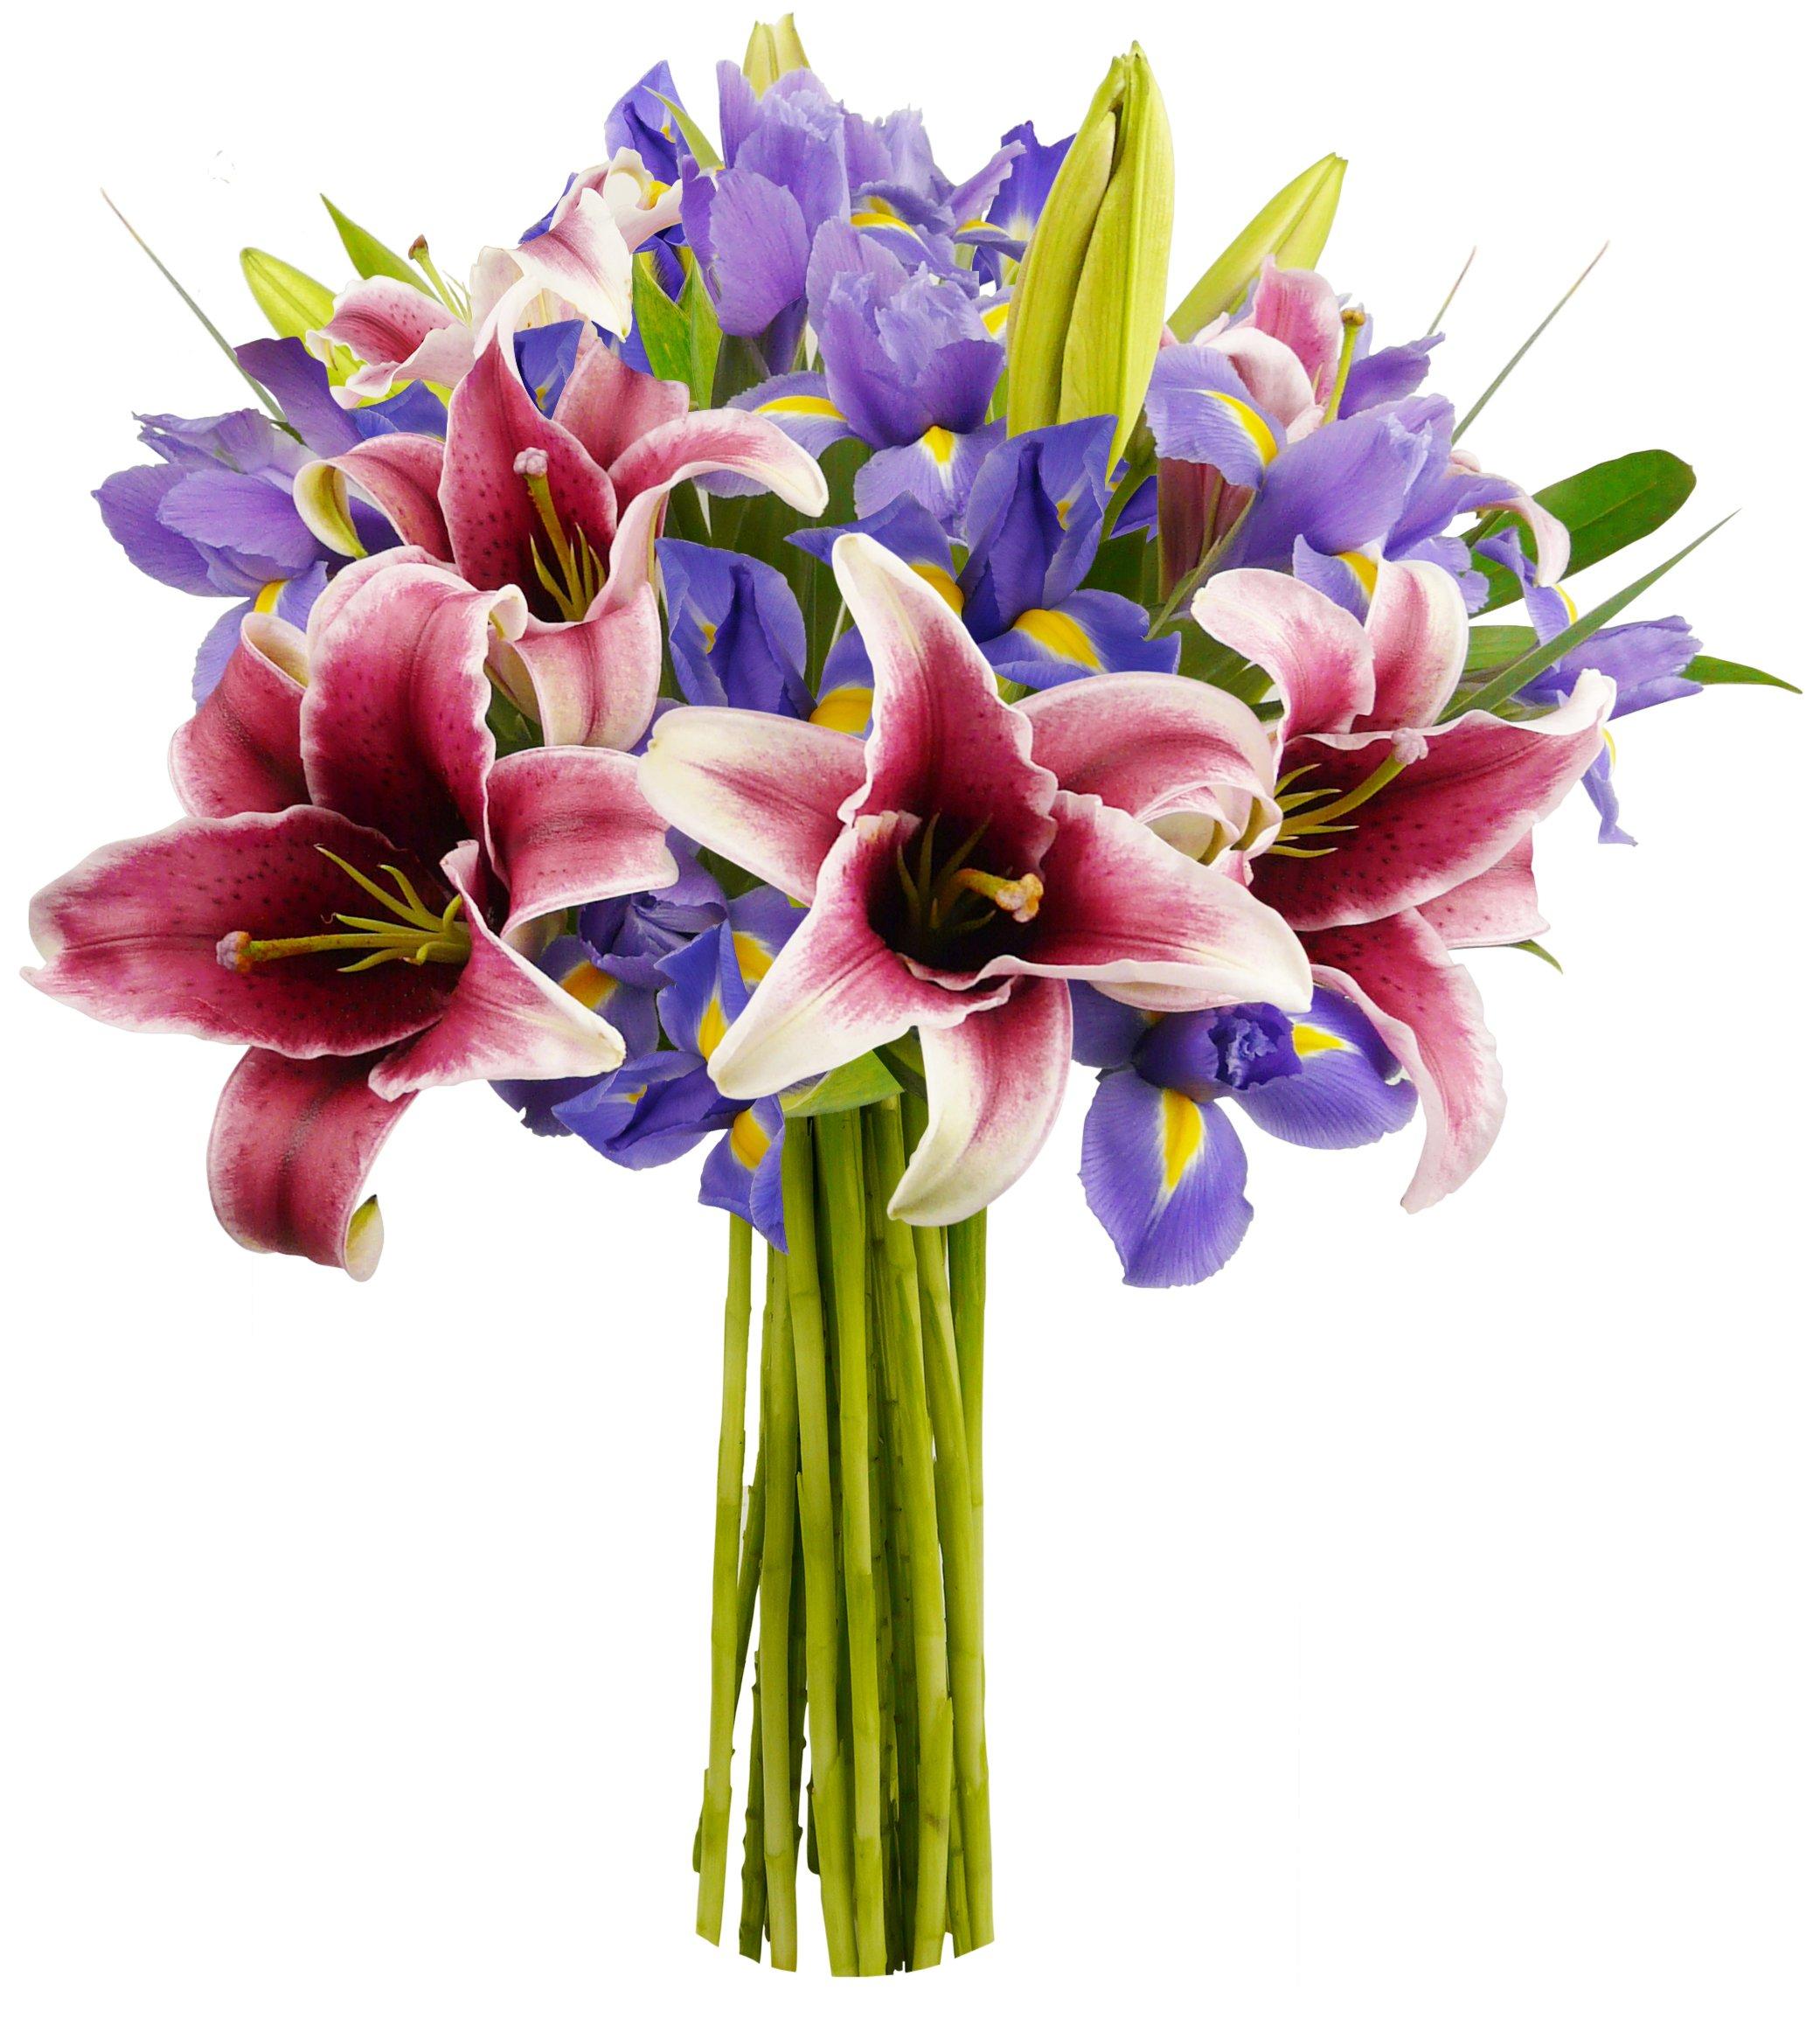 Benchmark Bouquets Stargazer Lilies And Iris No Vase